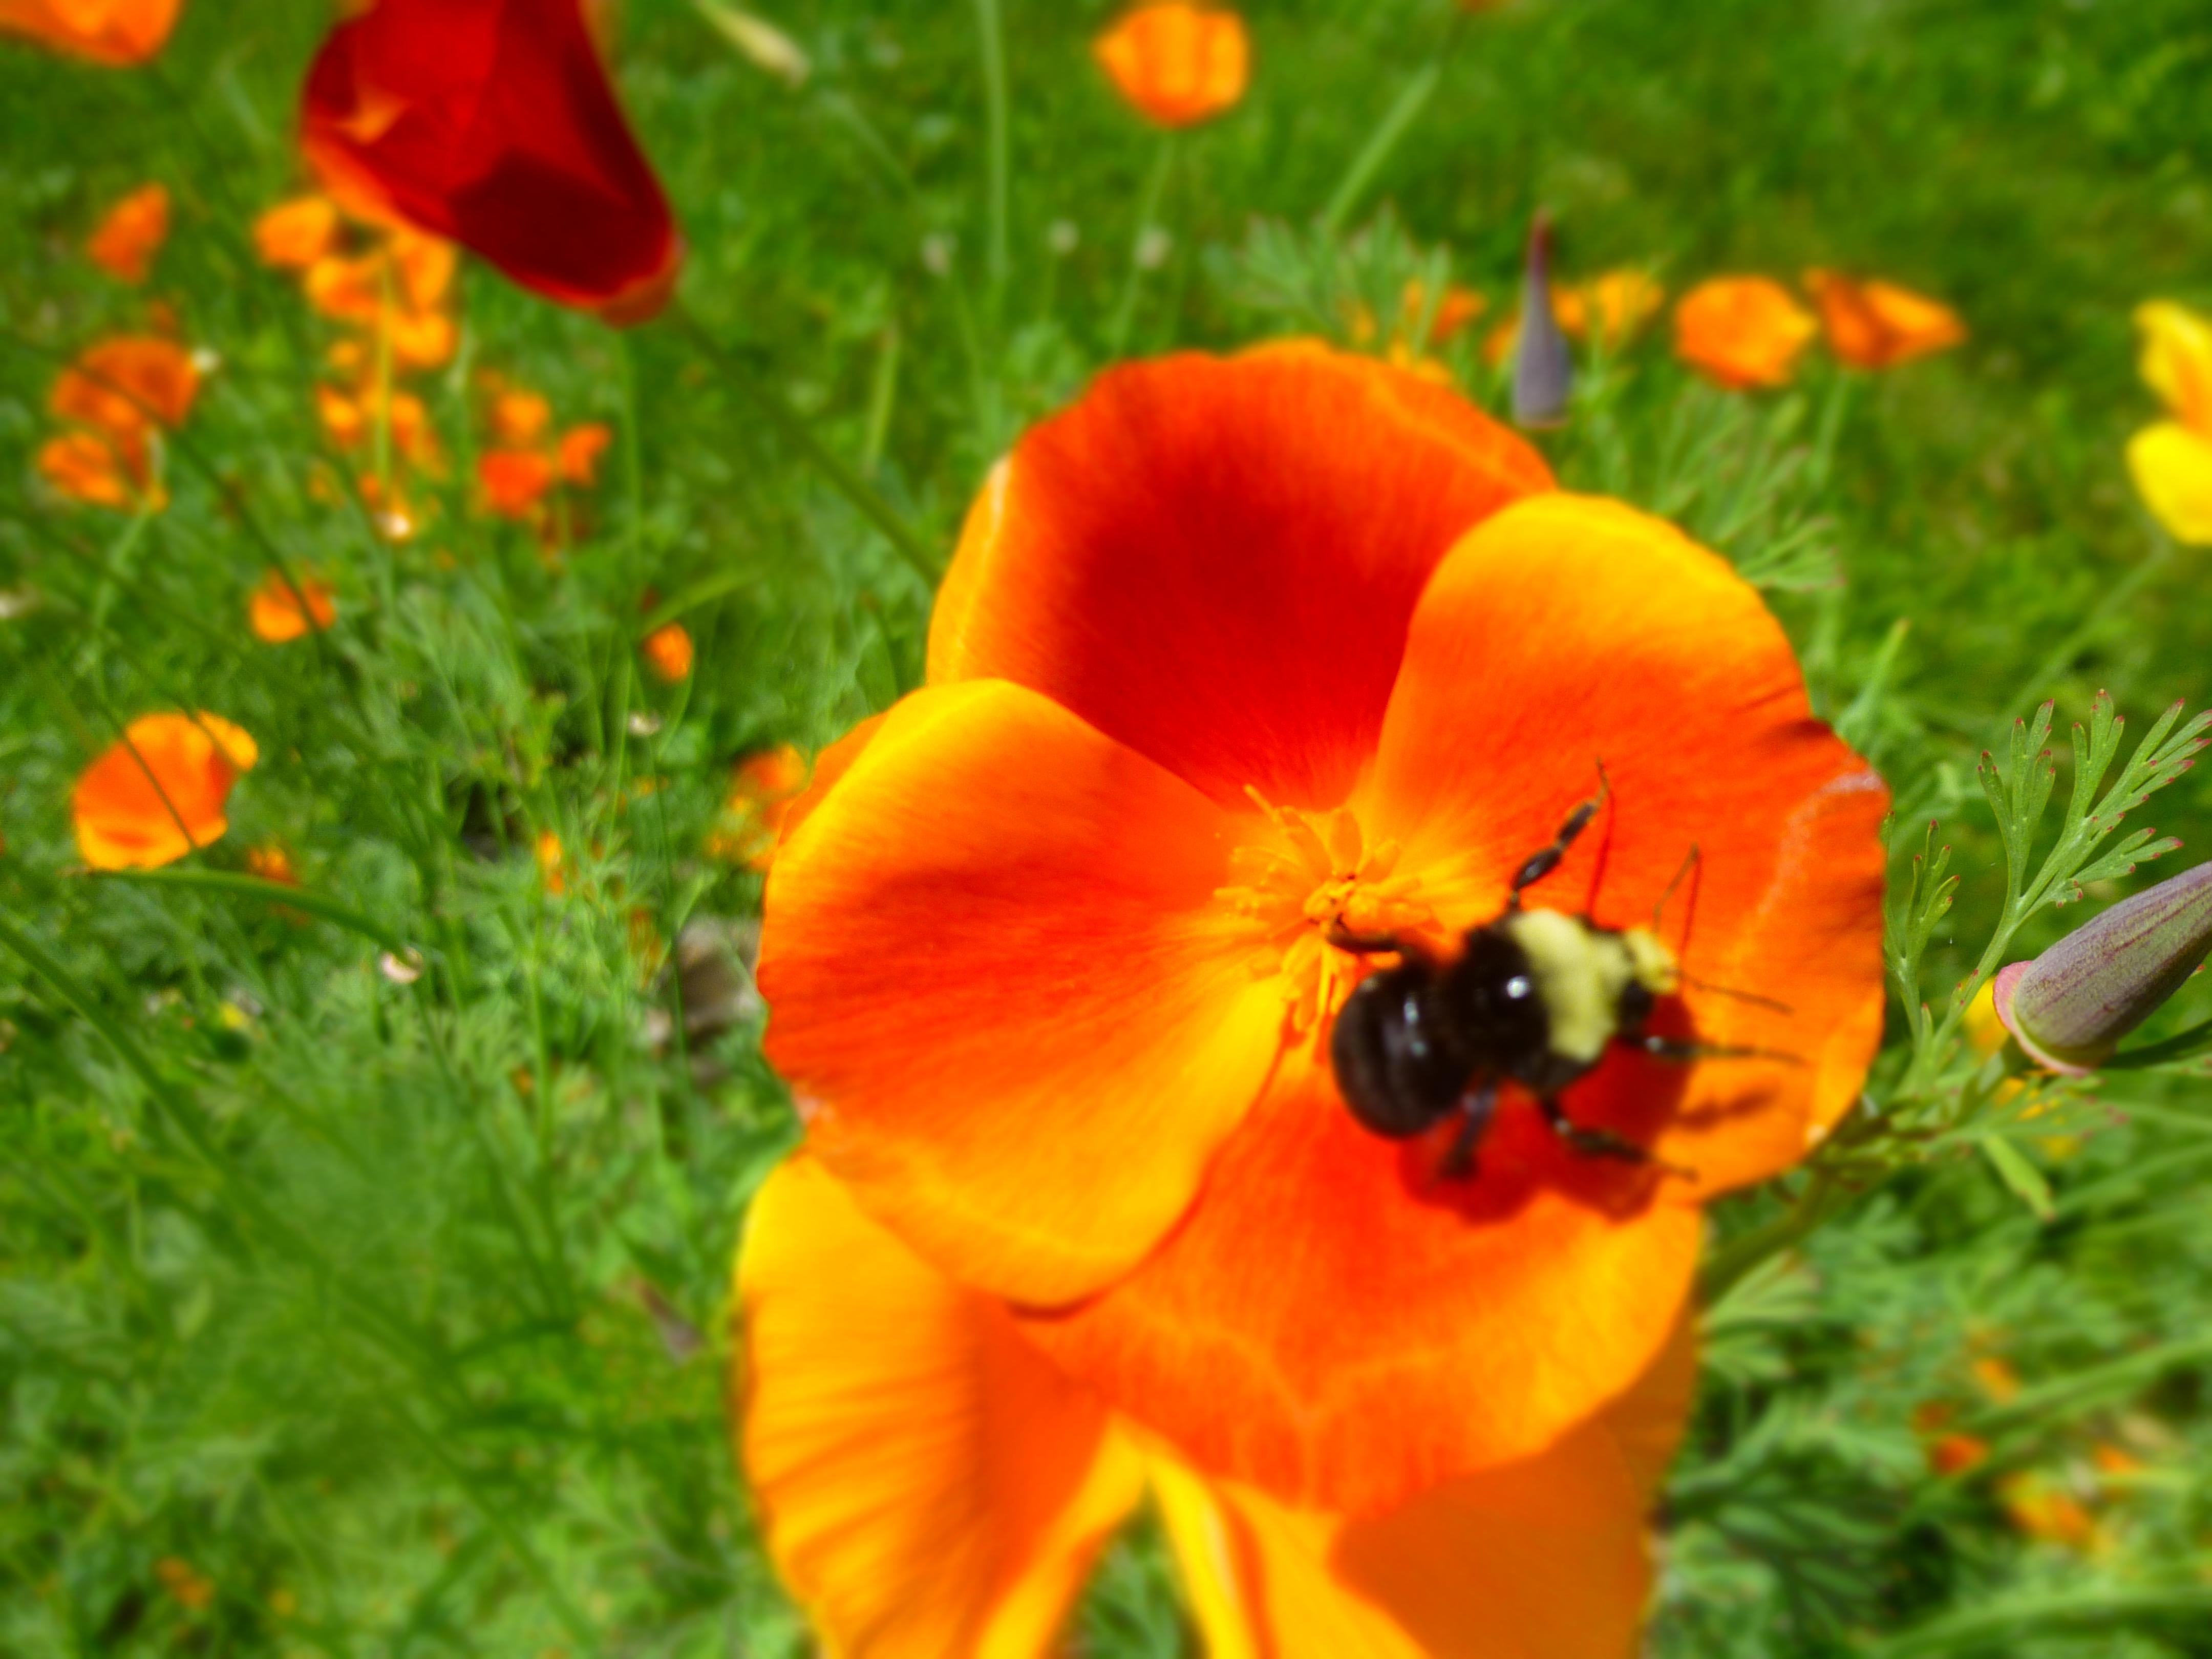 Bumble Bee in June accompanied by Orange Poppy. Credit: N.L. McKinley